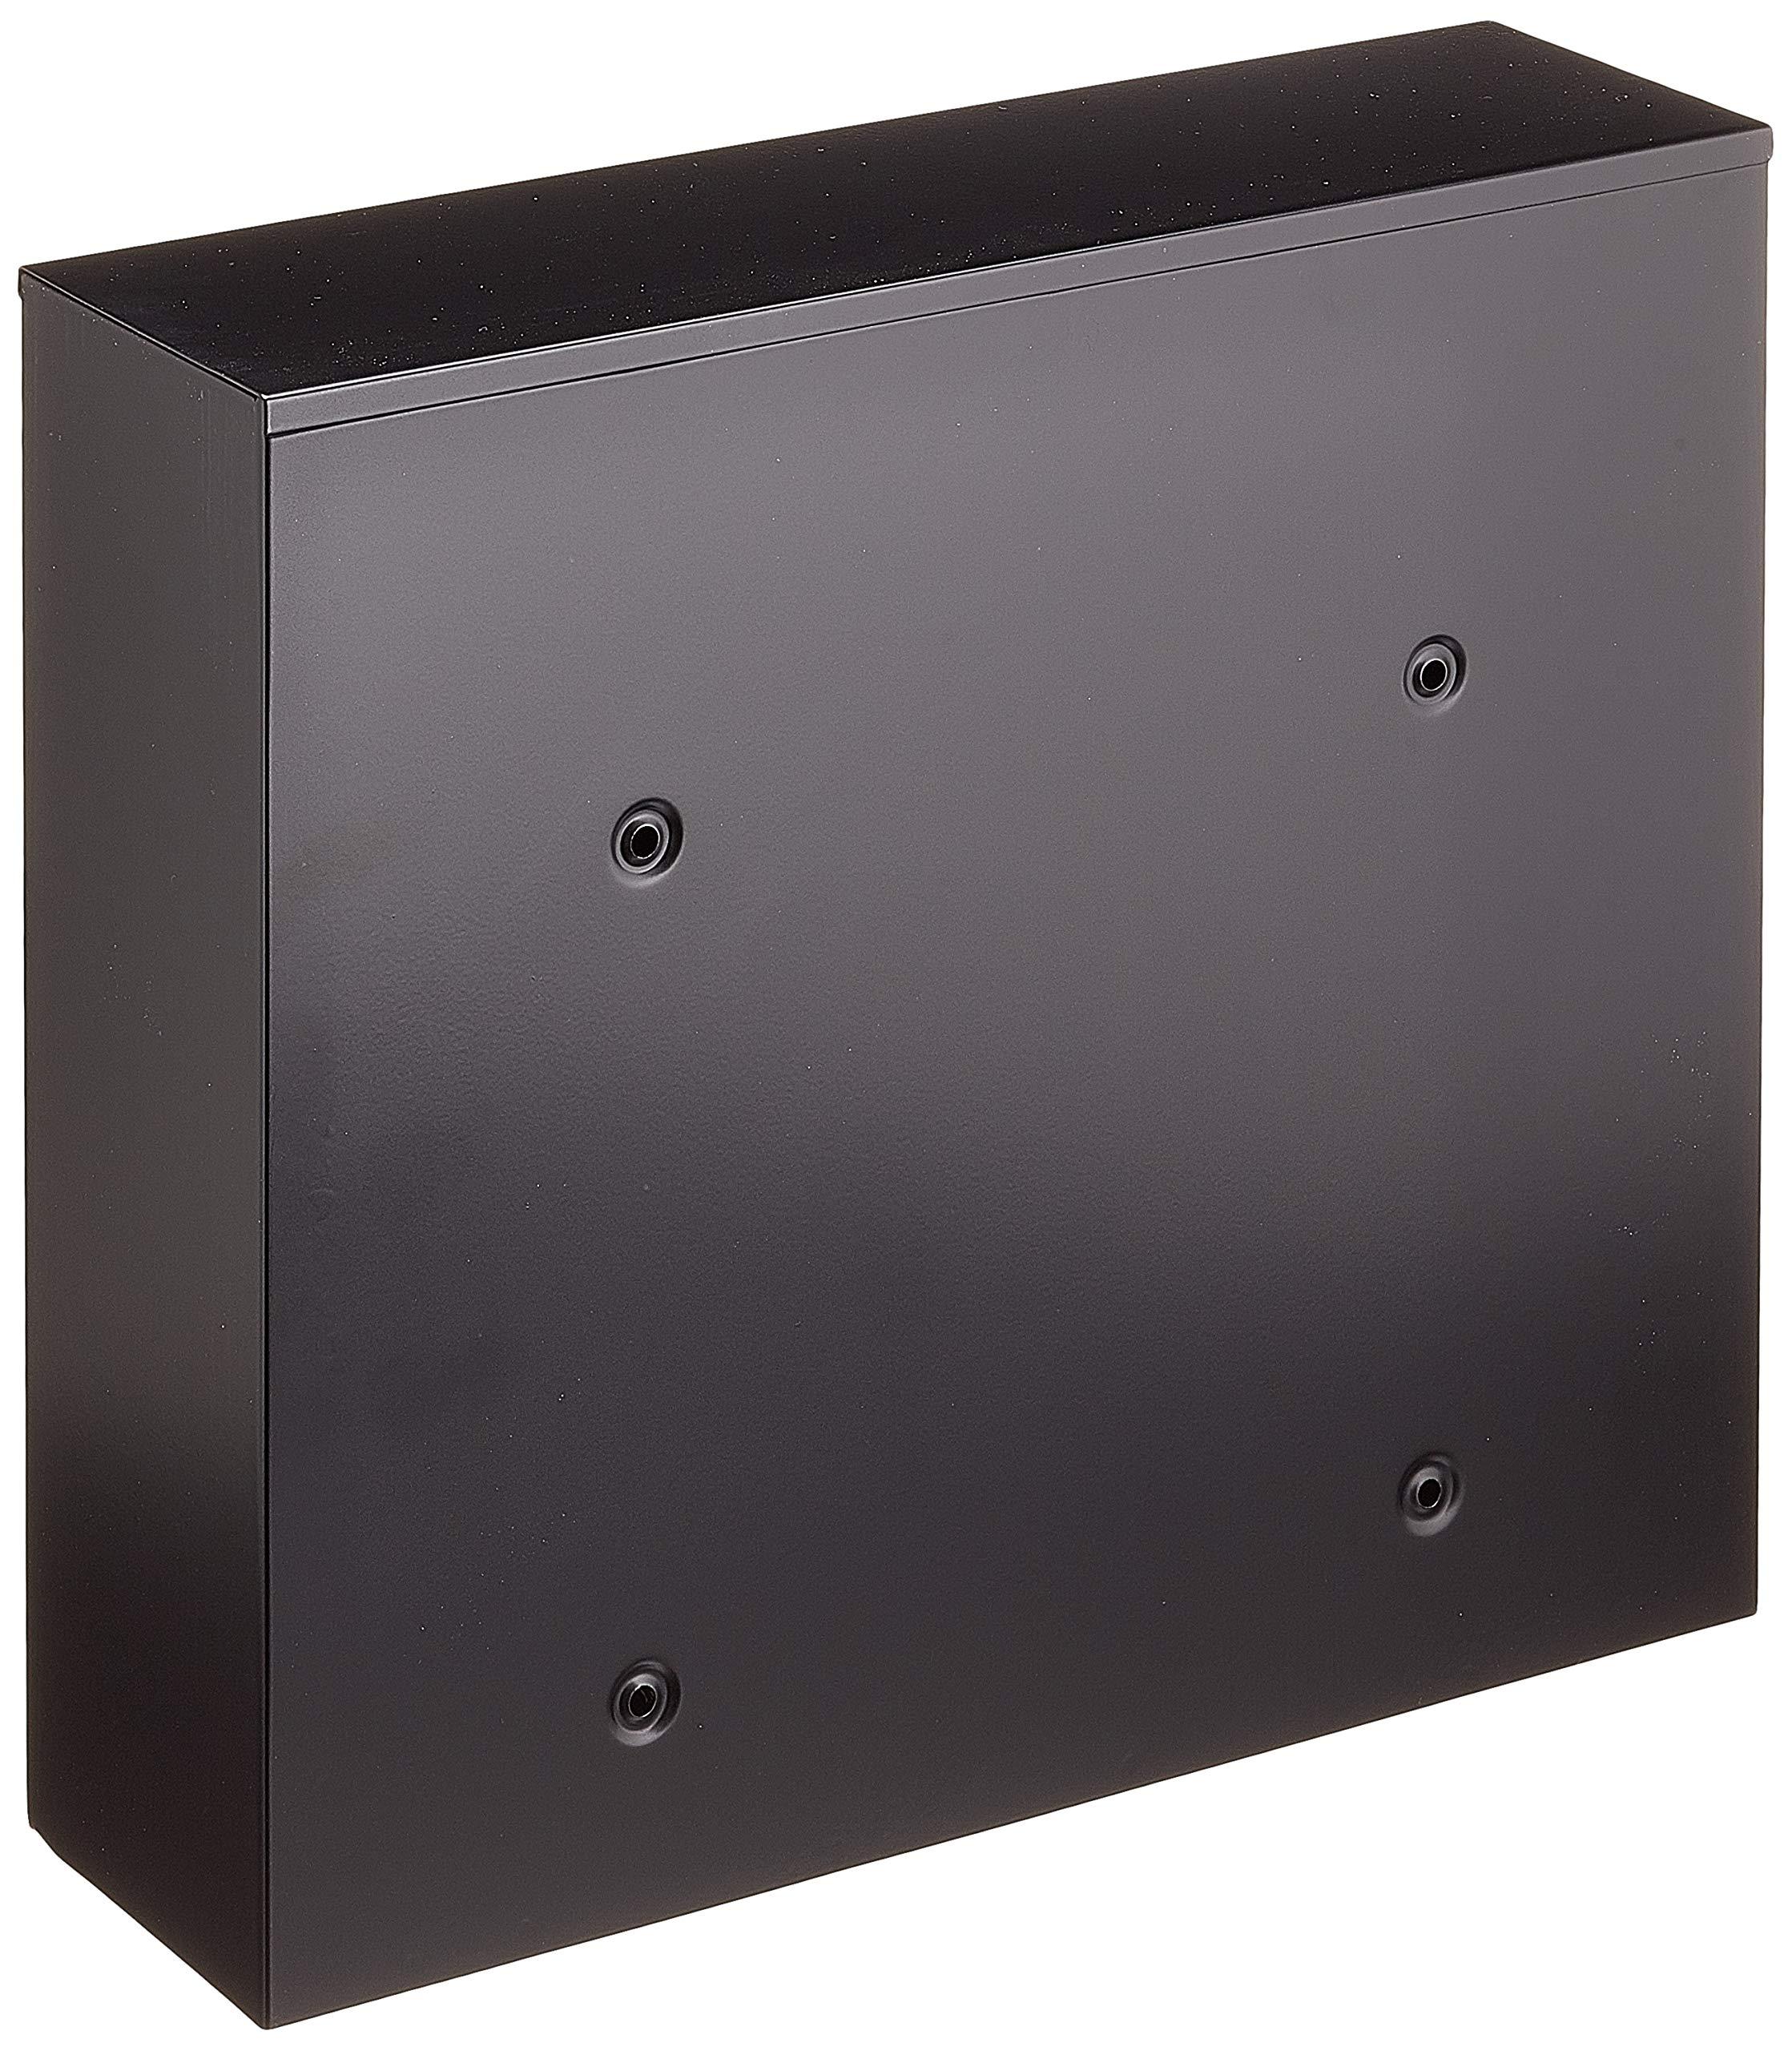 Buz/ón pared Acero galvanizado negro Correo Postal decorativo V13